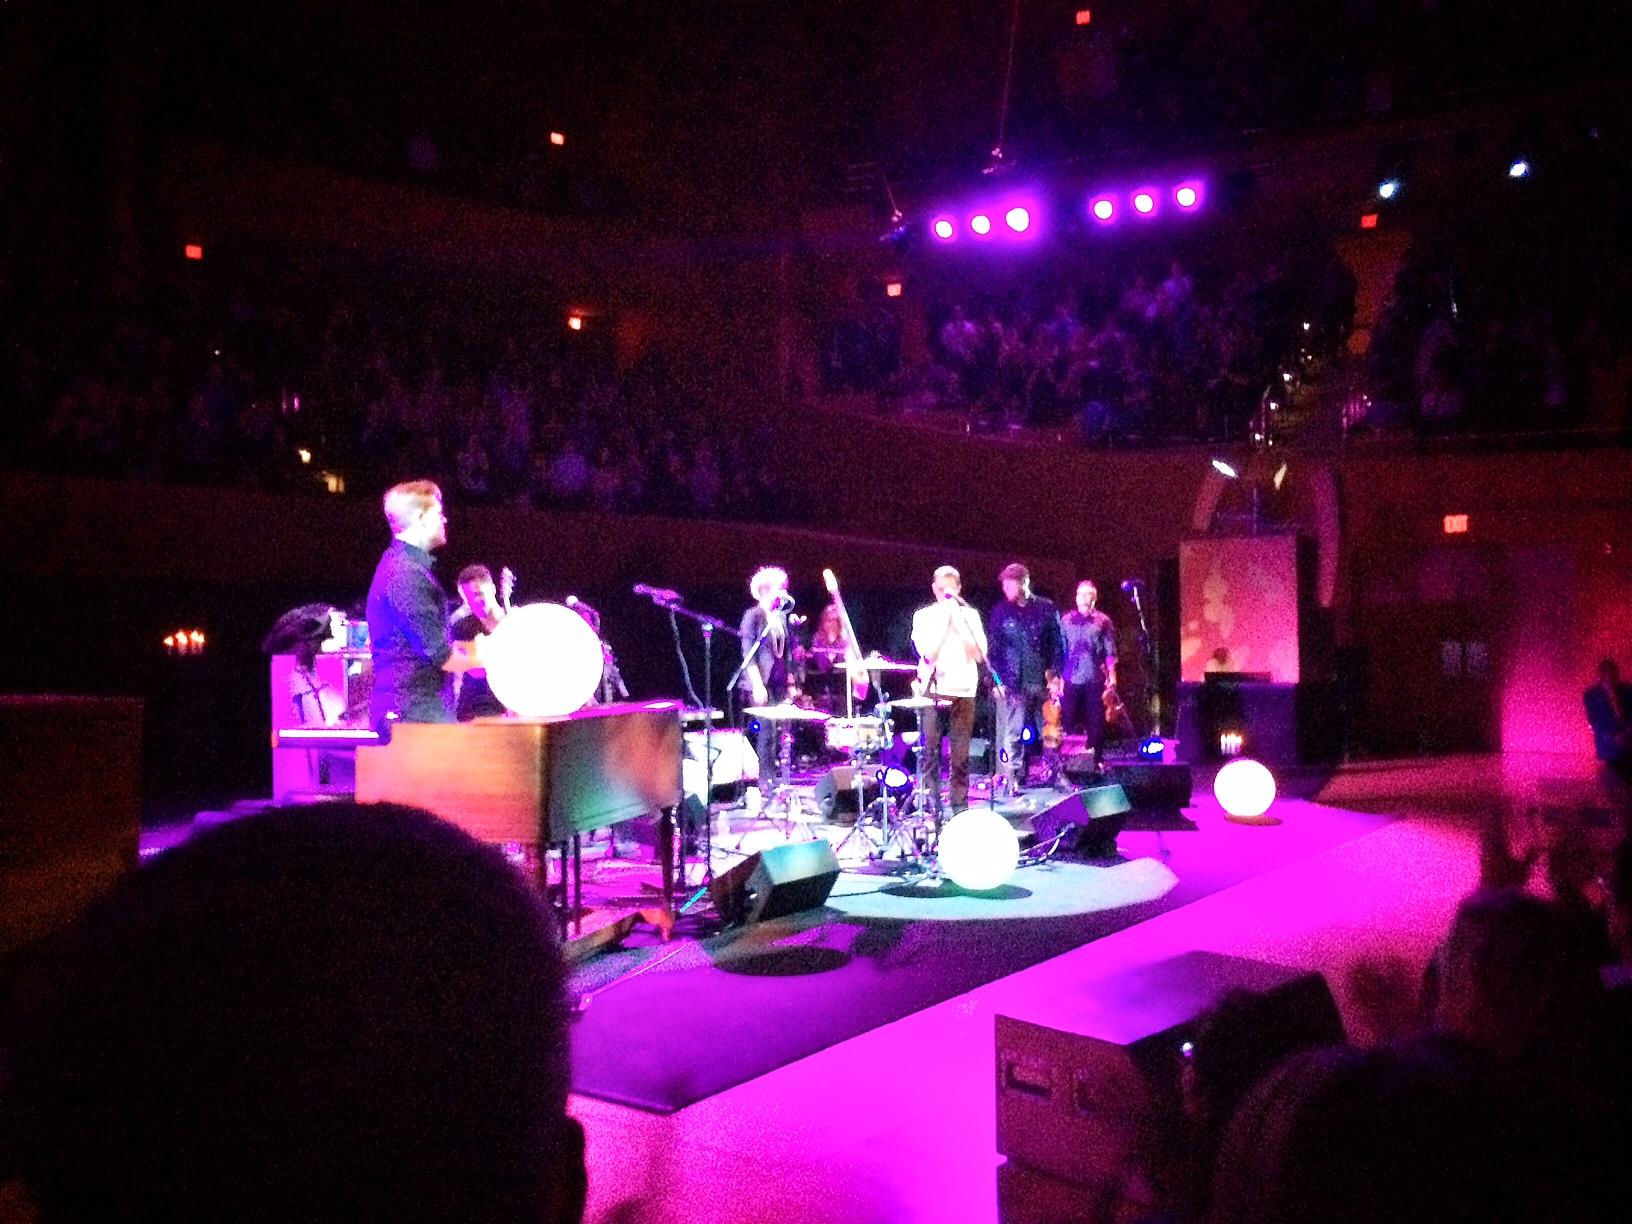 Rhye at the Walt Disney Concert Hall 2014